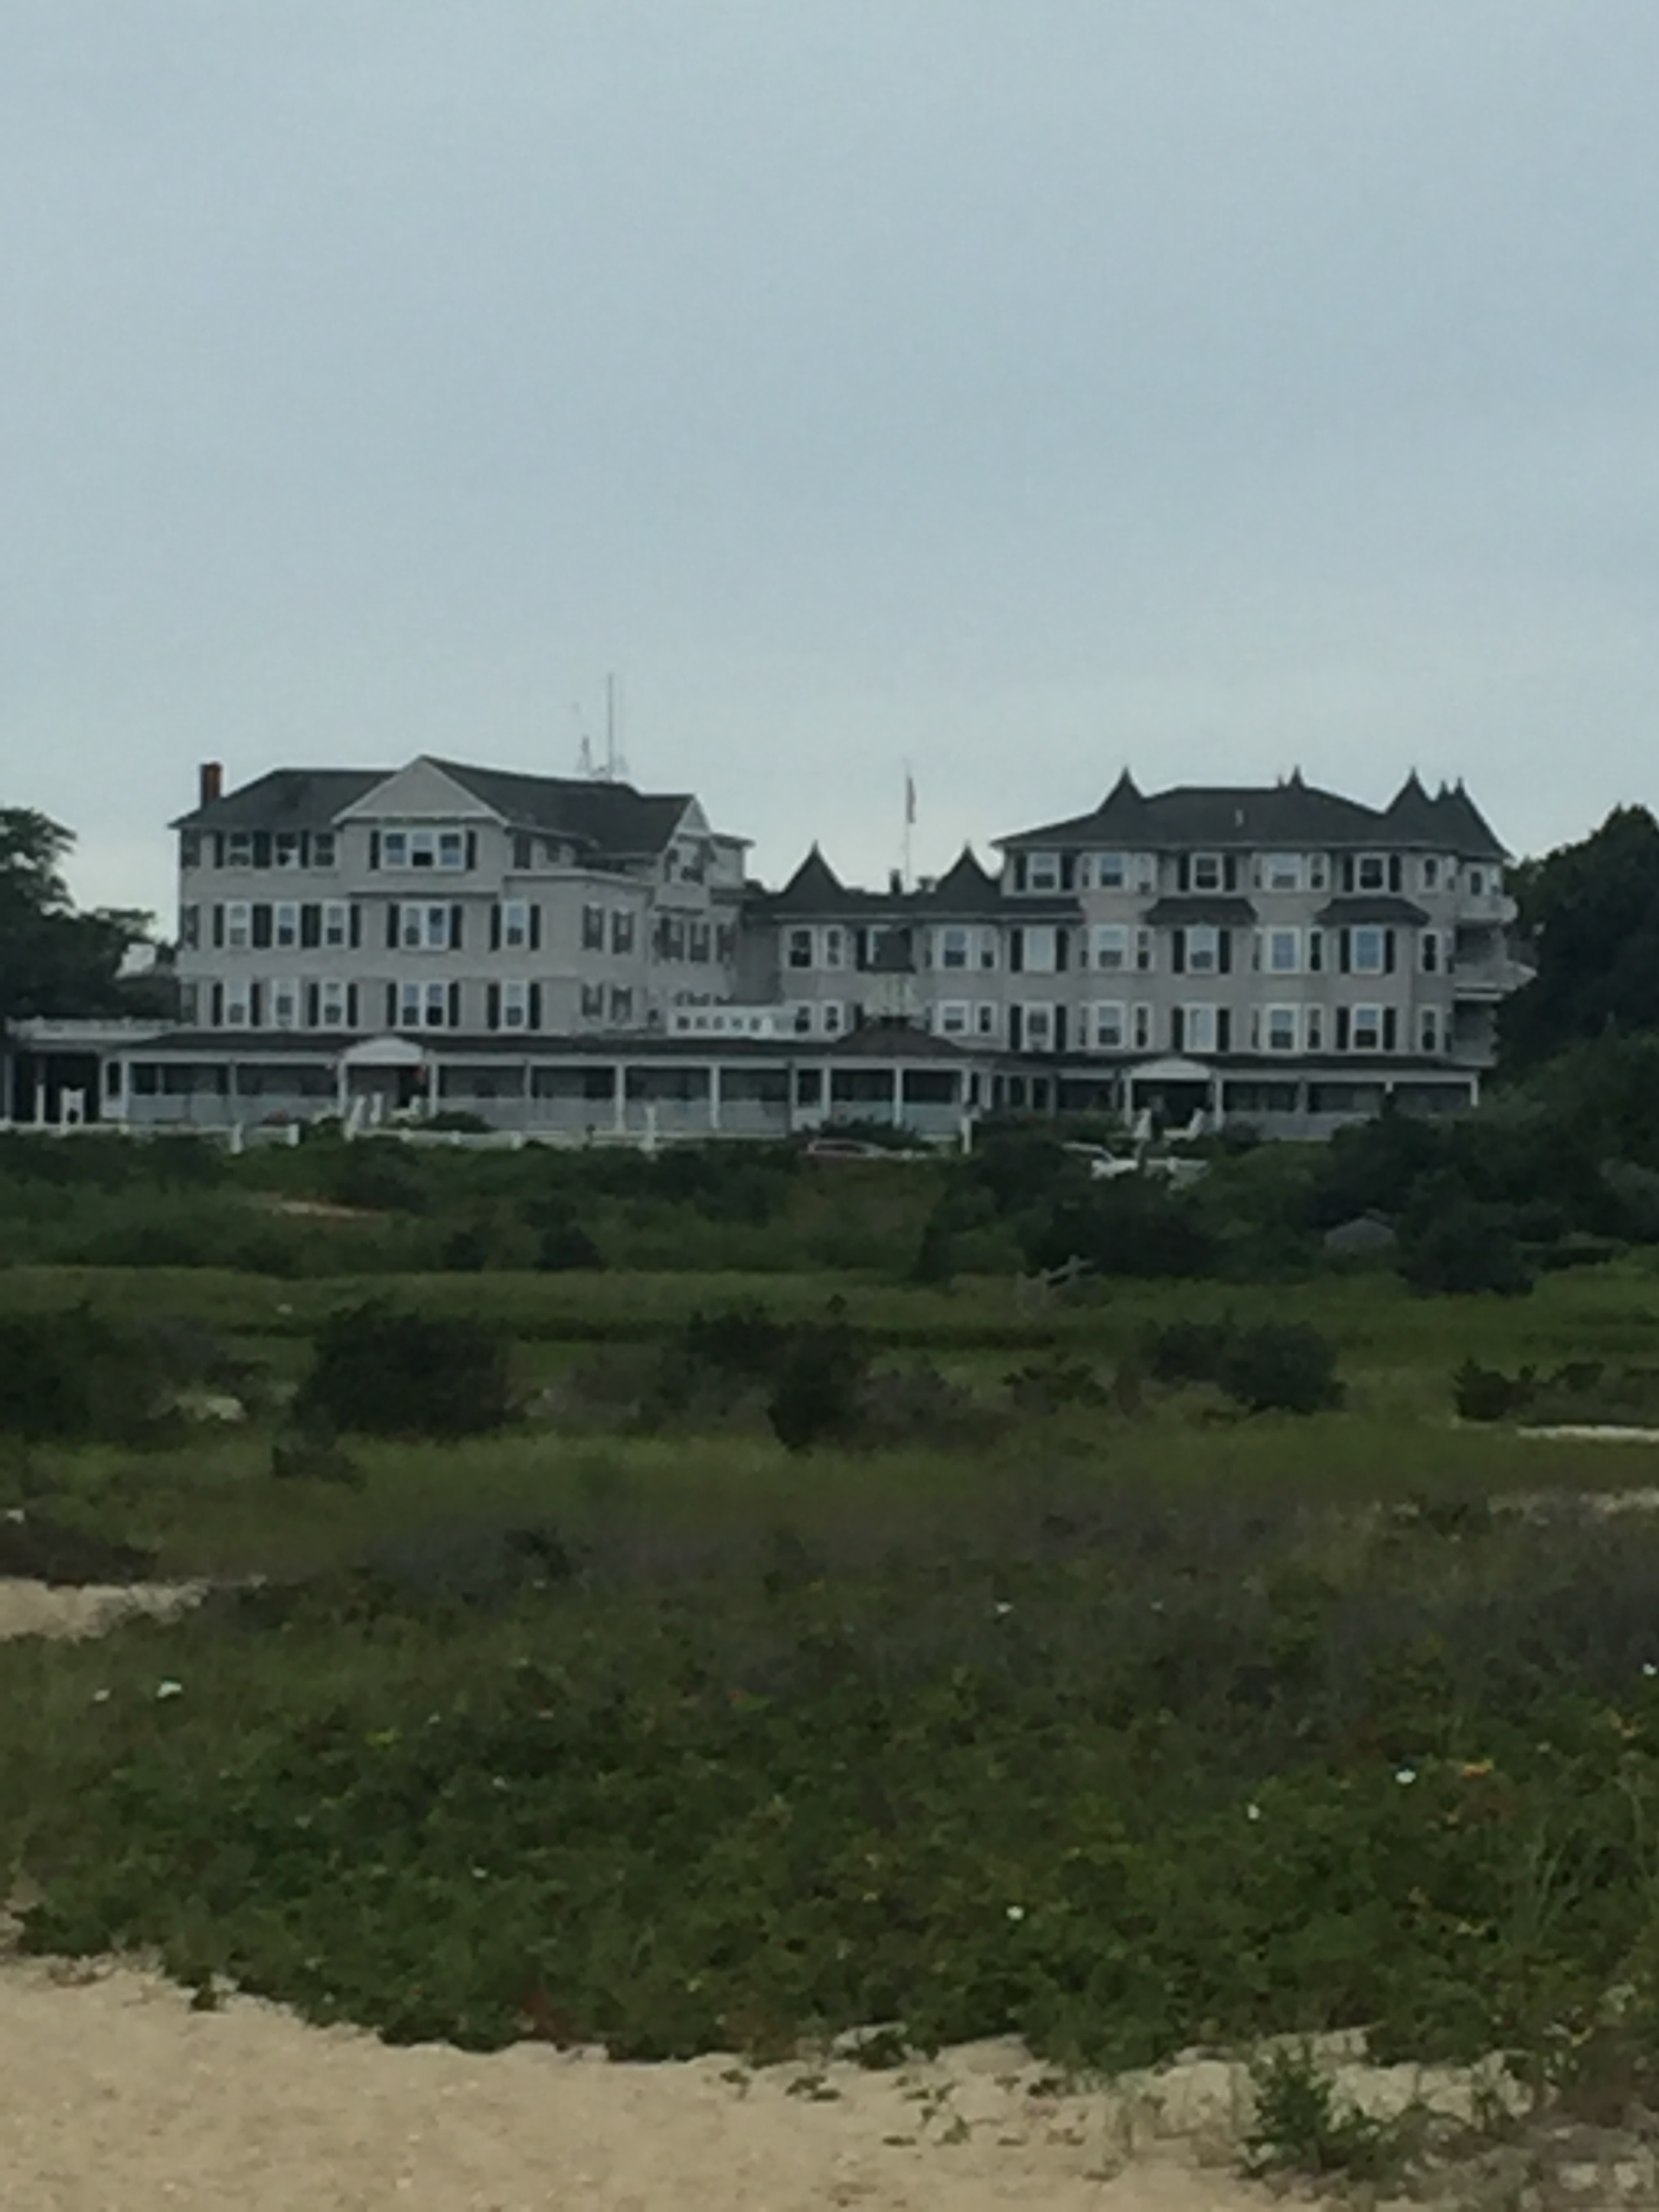 Historic Harbor View Hotel